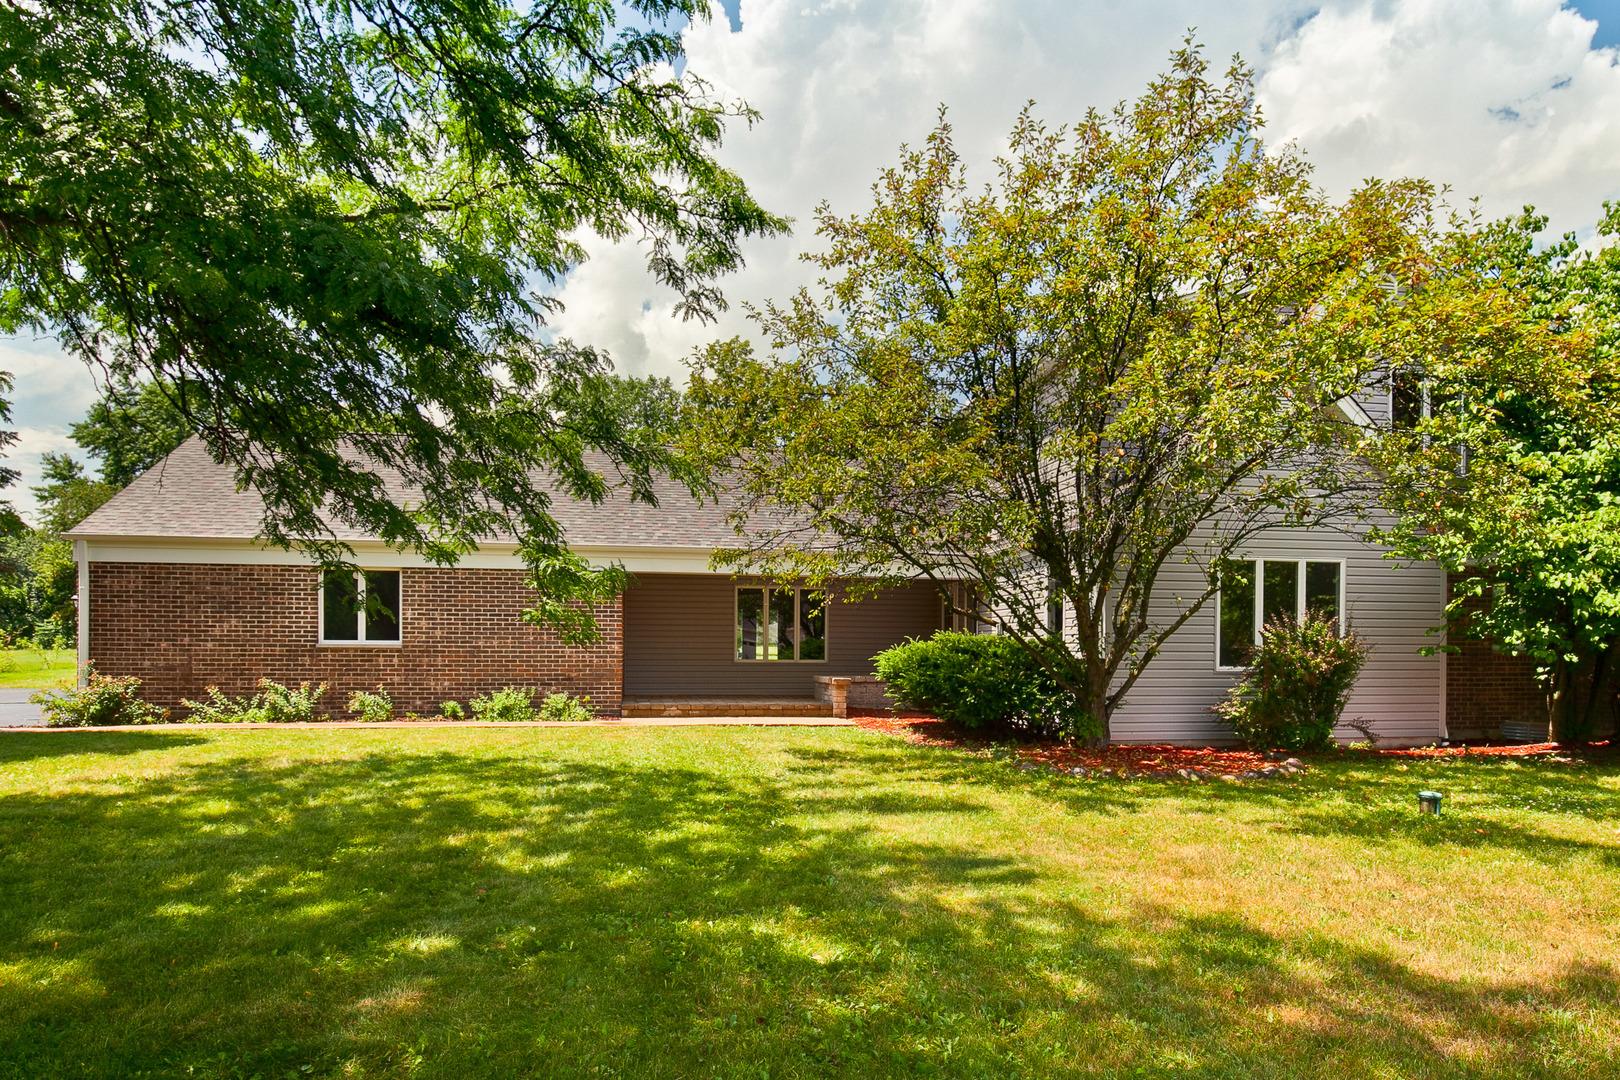 25644 North Arrowhead Drive, Long Grove, Illinois 60060